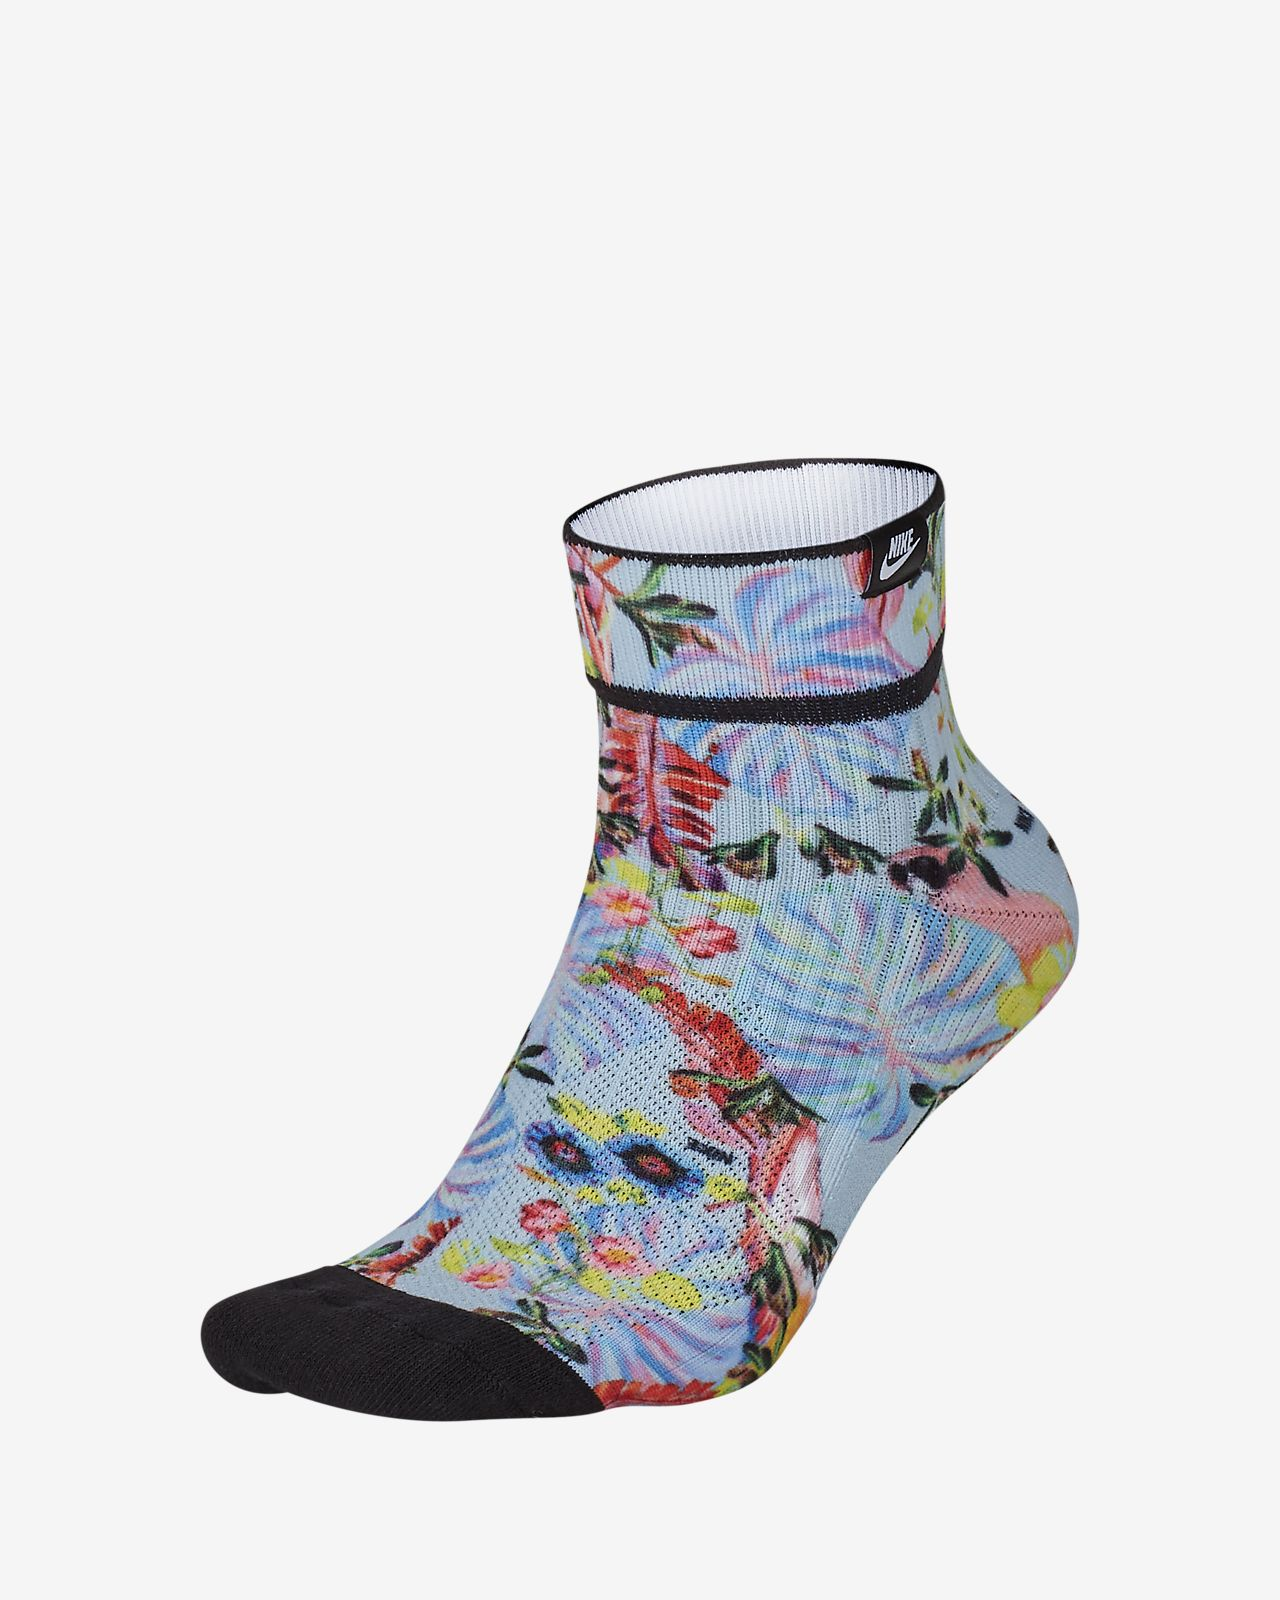 Nike SNEAKR Sox Floral Ankle Socks